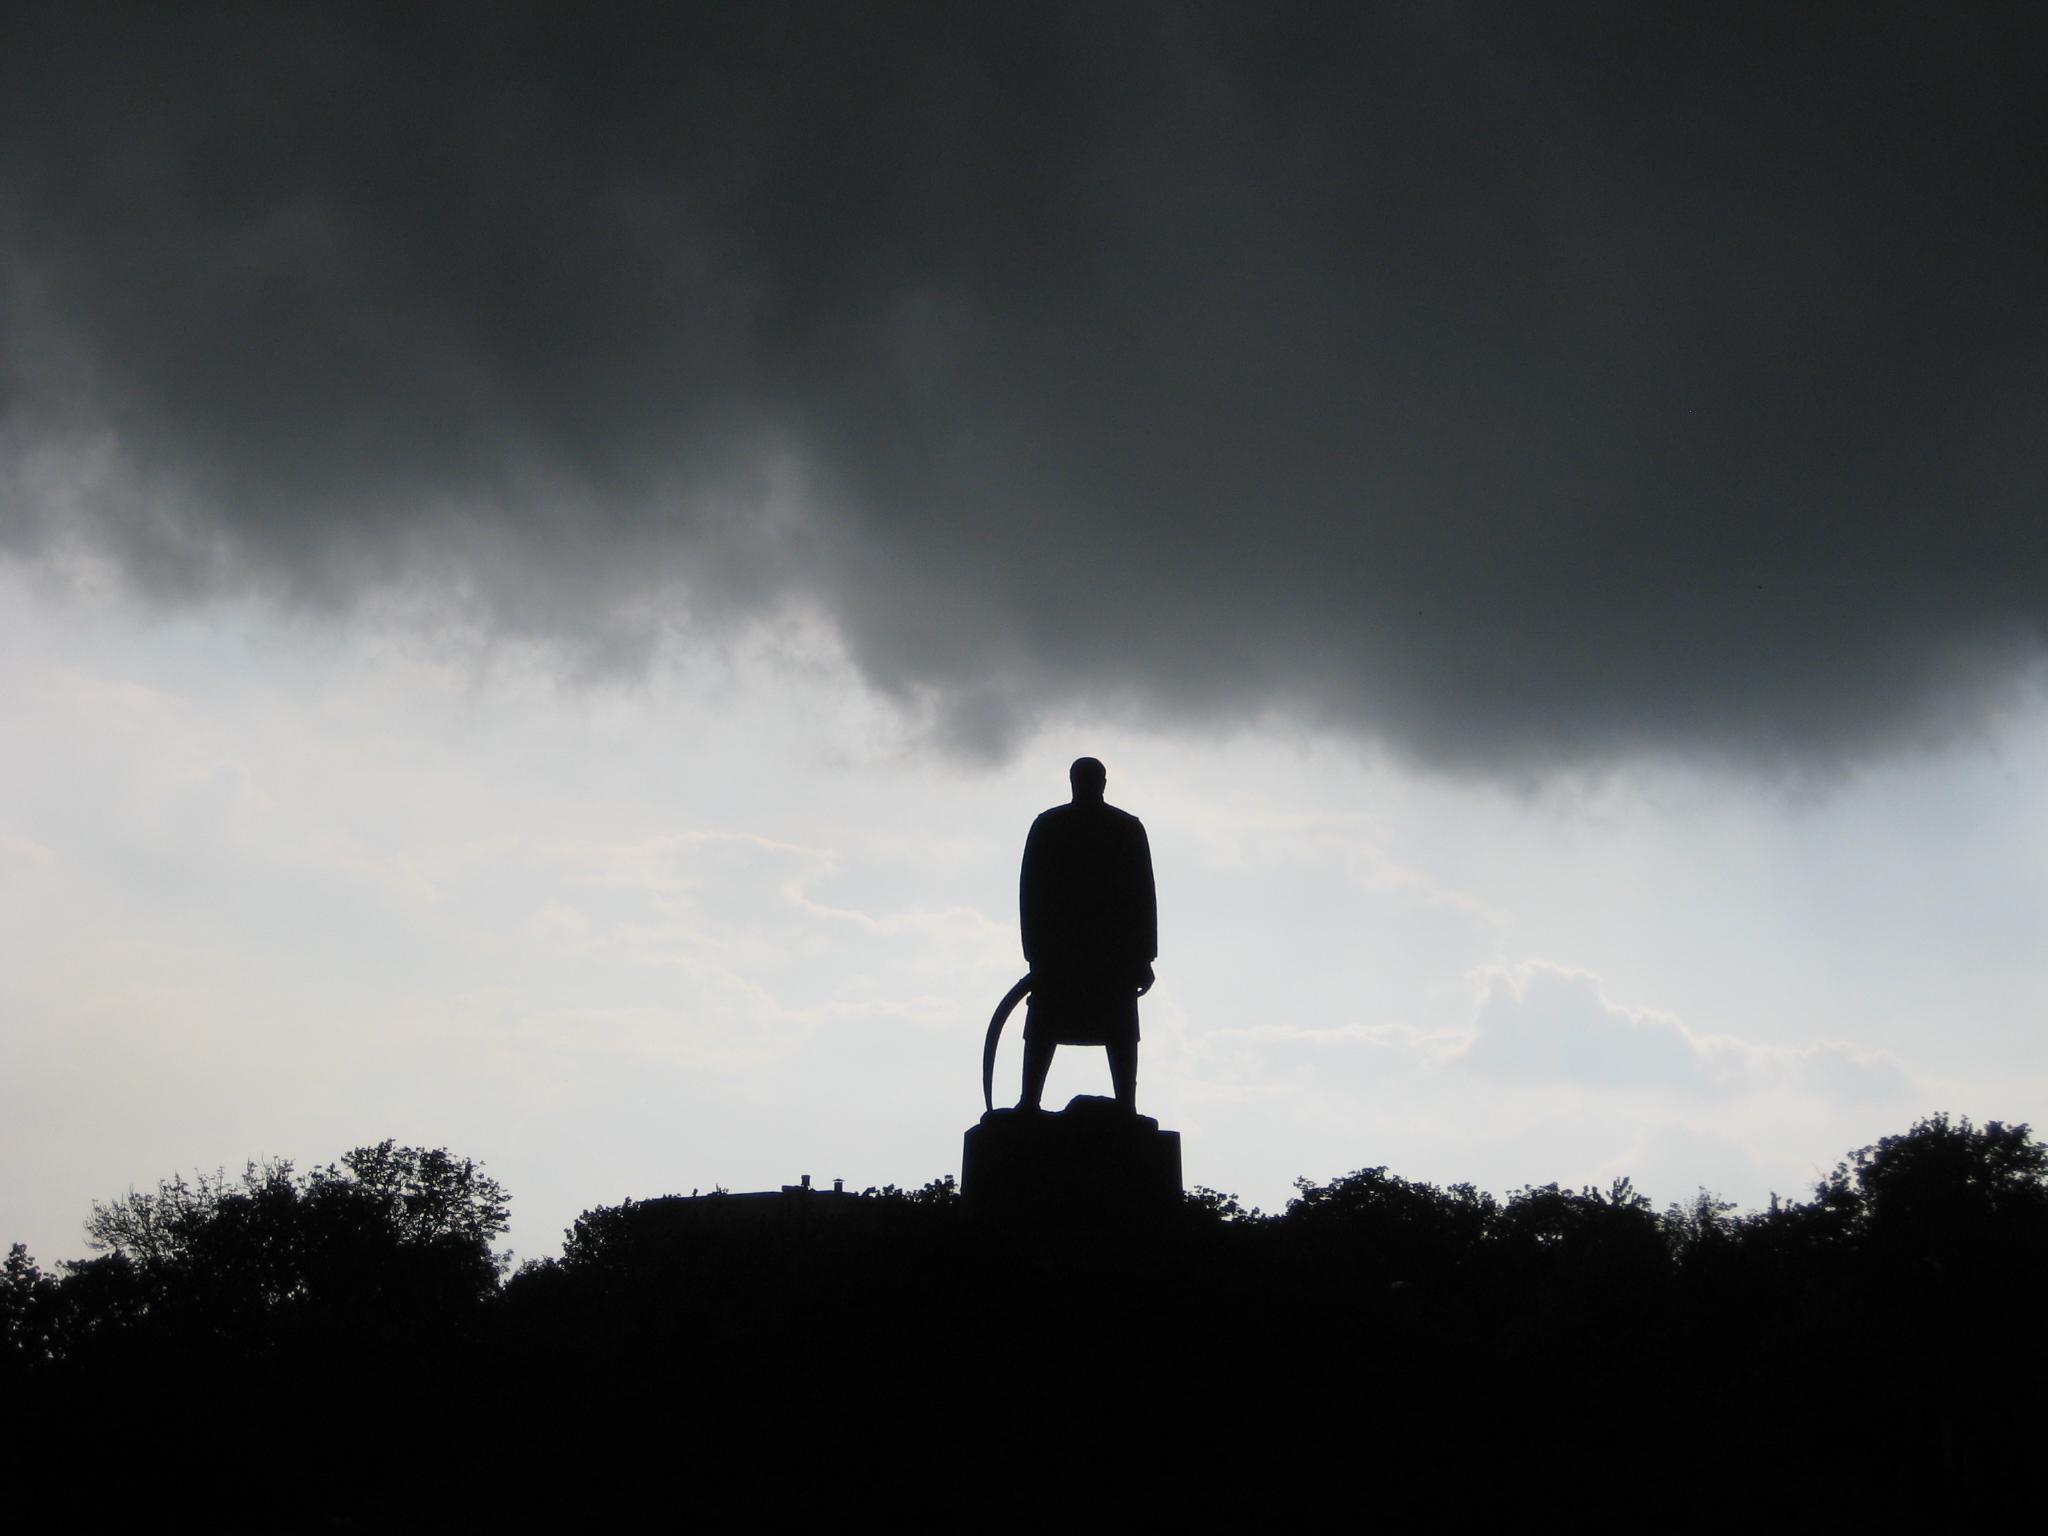 Karađorđe Petrović monument in Belgrade, Serbia